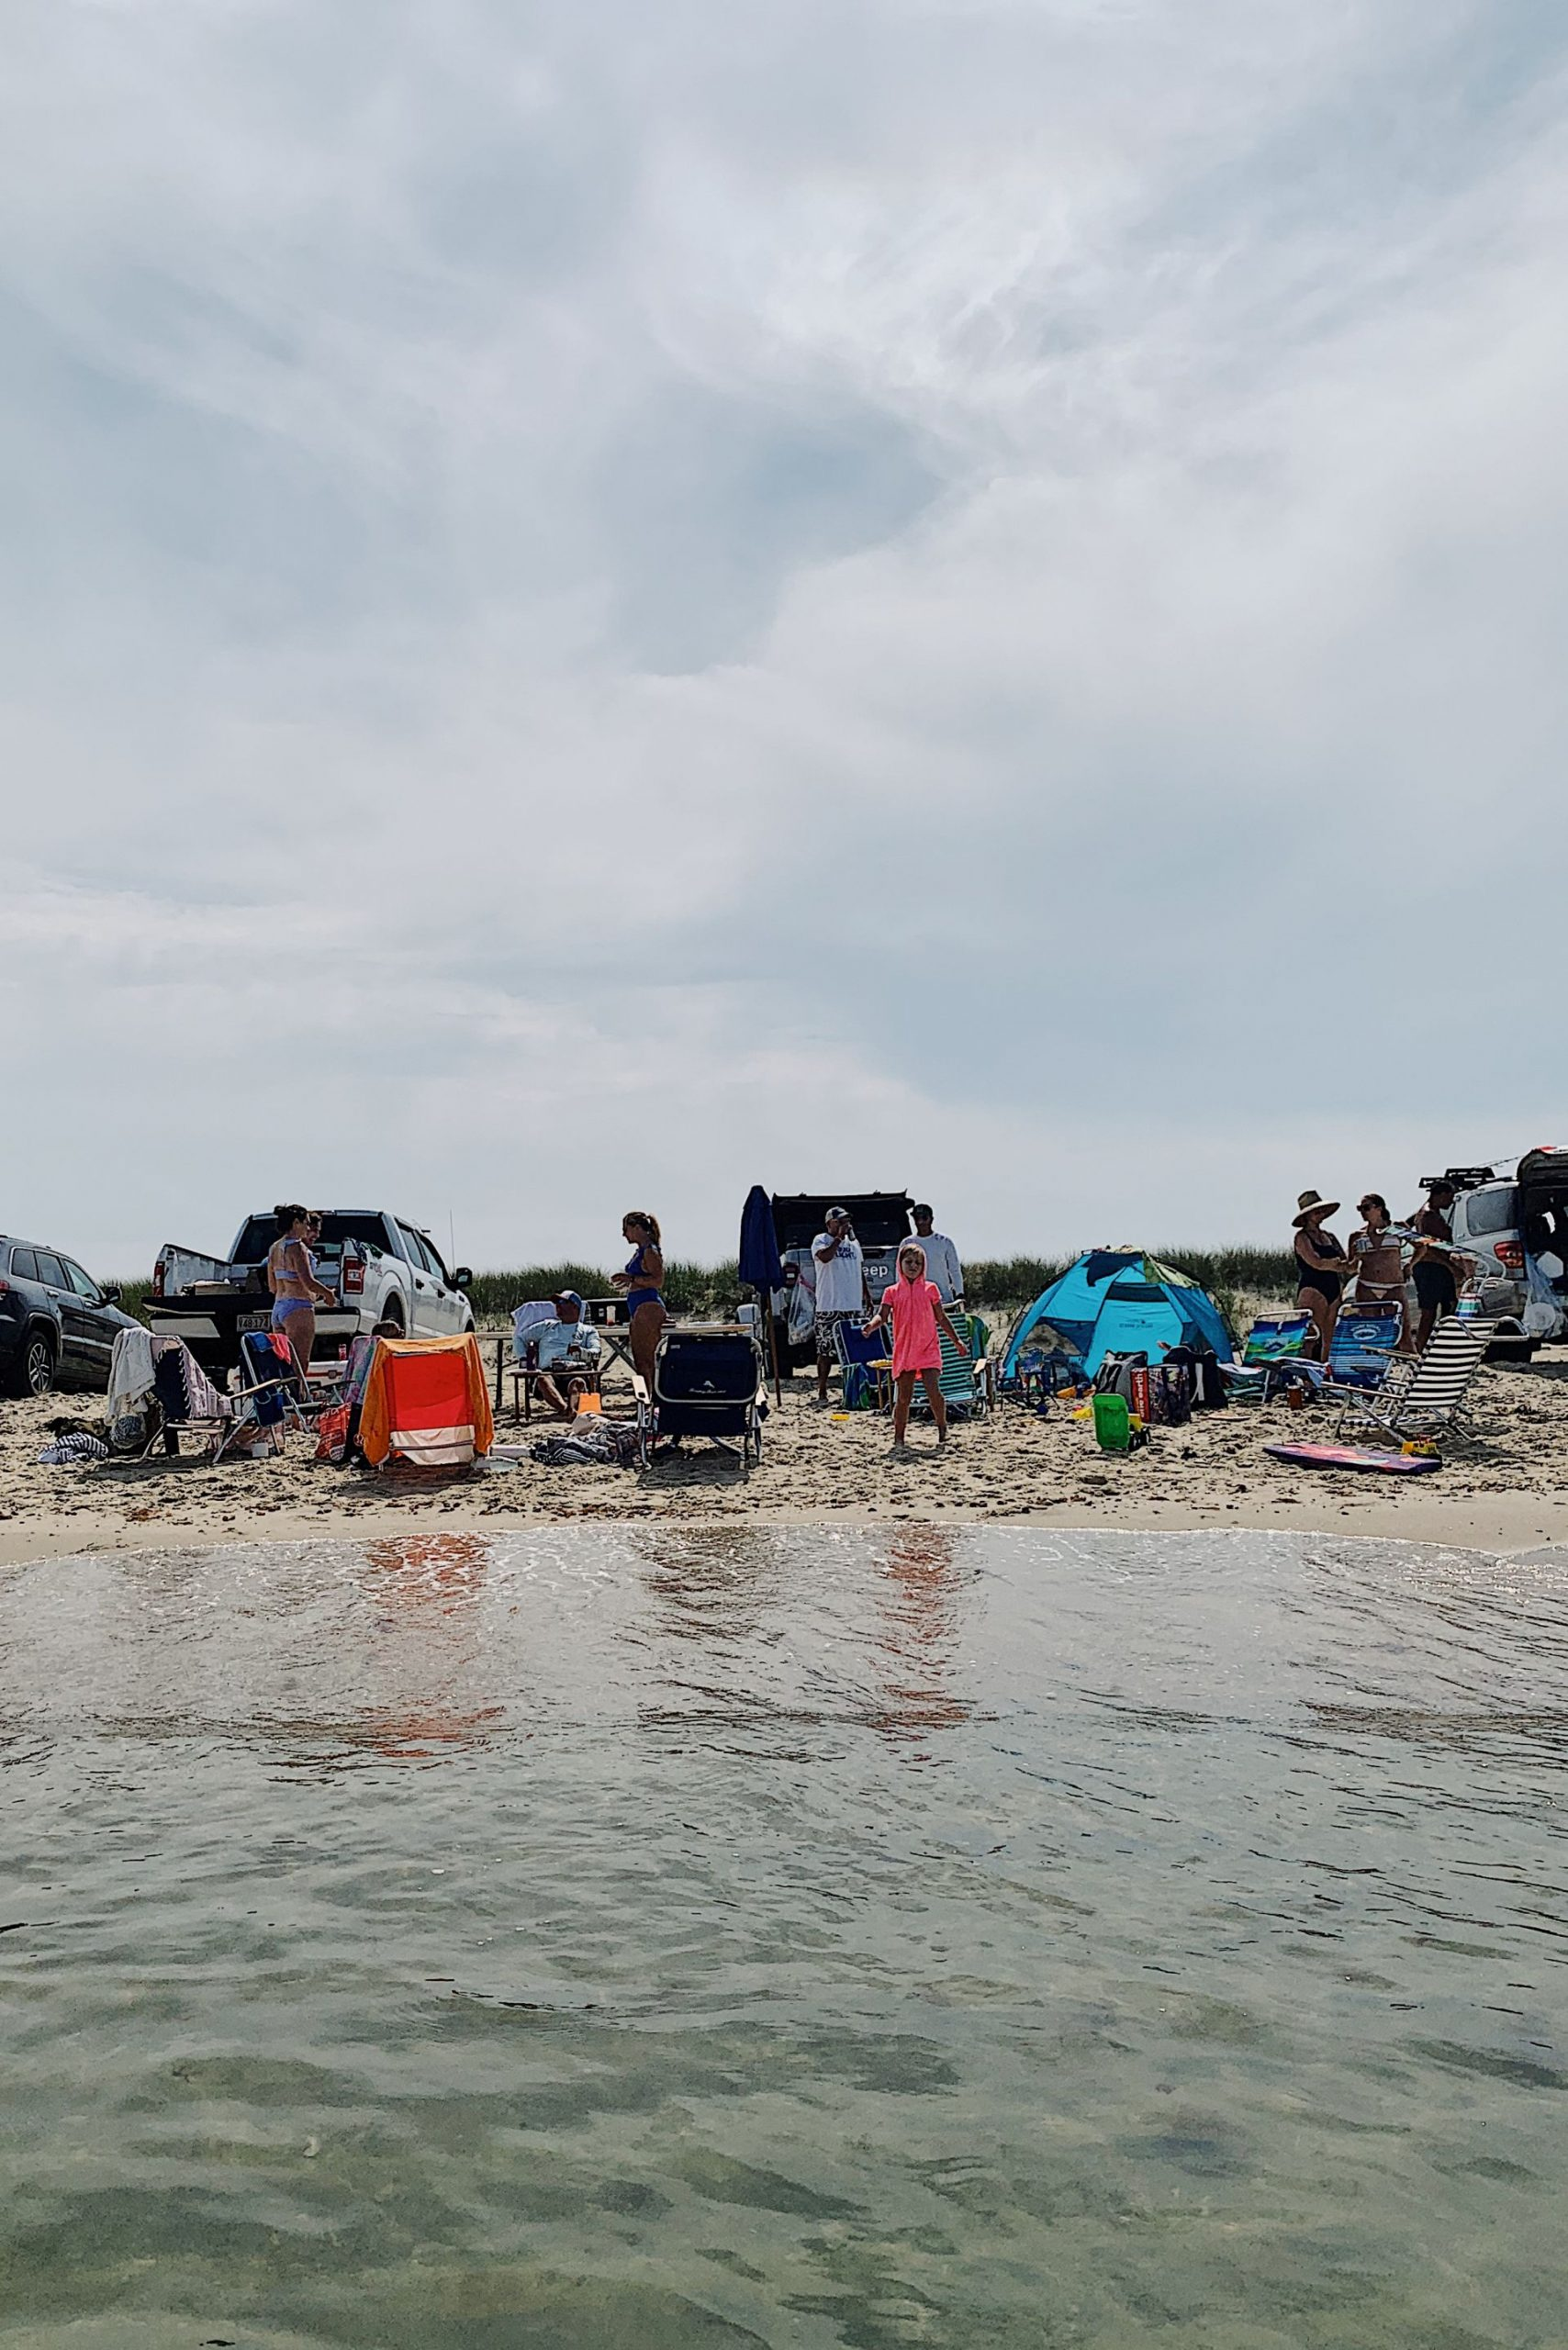 Travel blogger Meaghan Murray shares a post o Nantucket, Massachusetts on her blog The Stopover